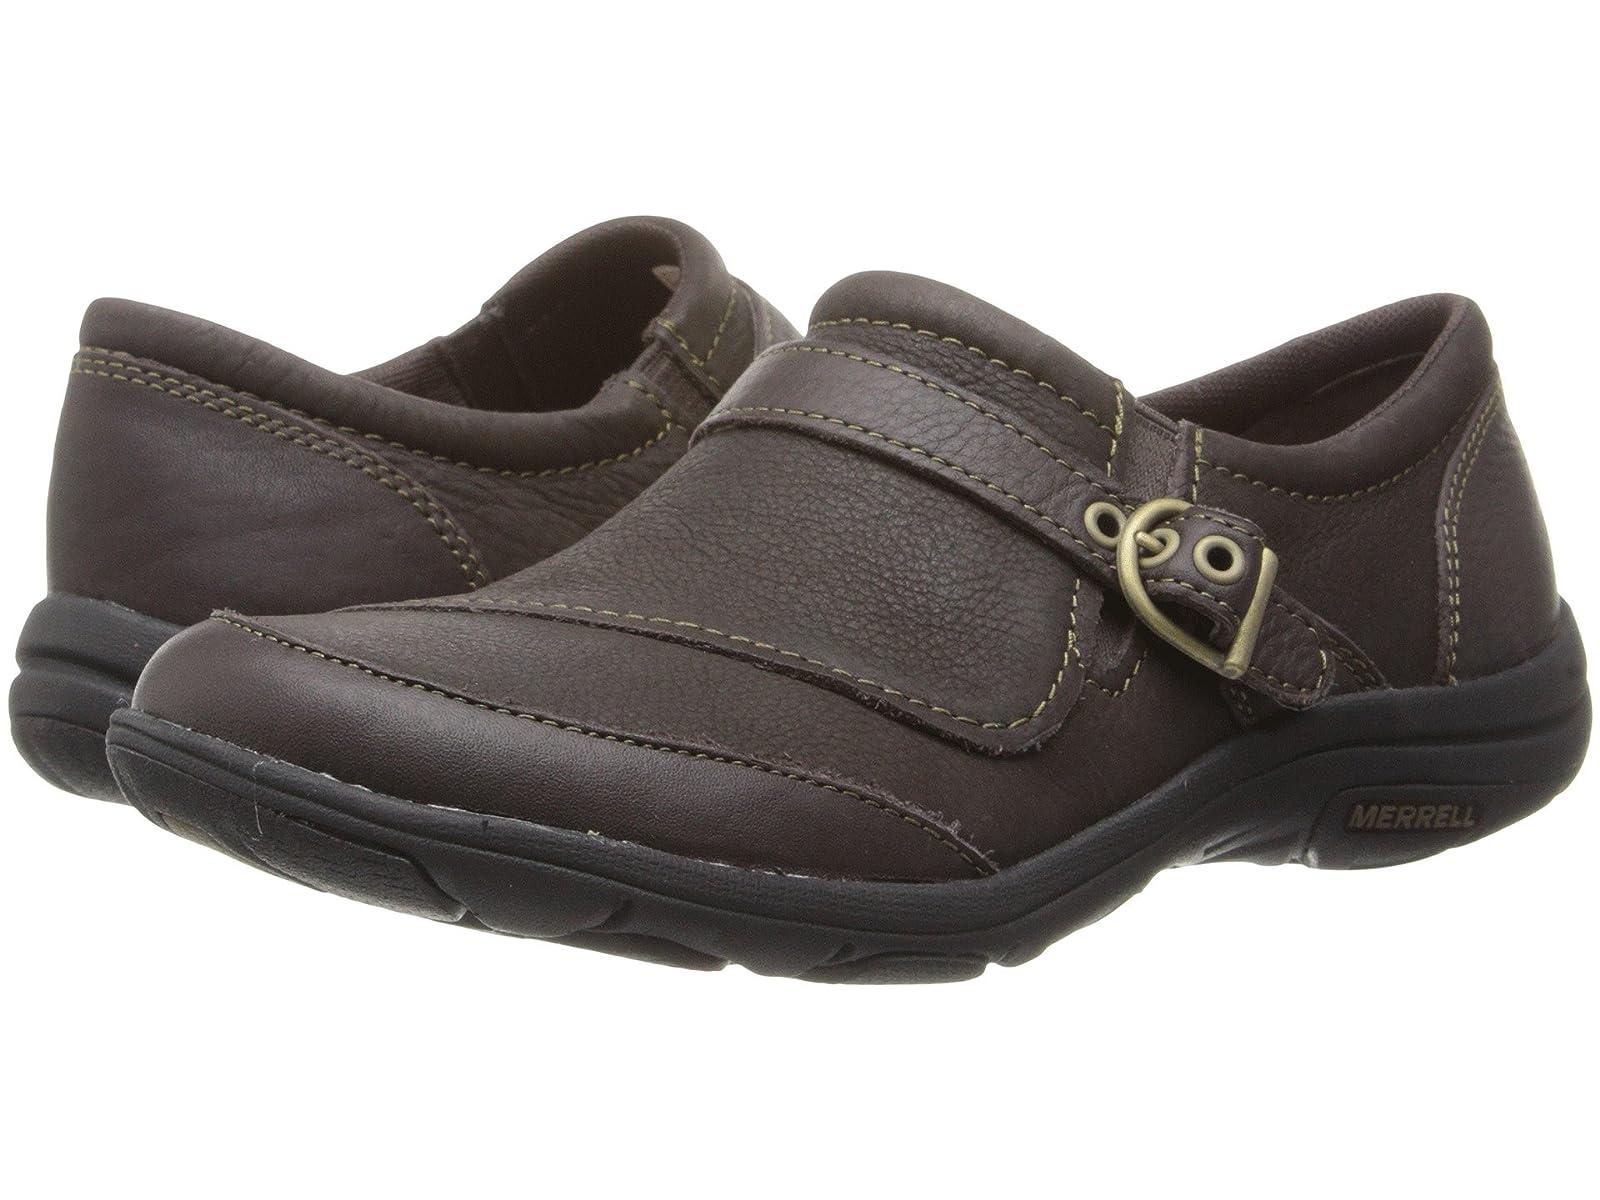 Merrell Dassie BuckleCheap and distinctive eye-catching shoes